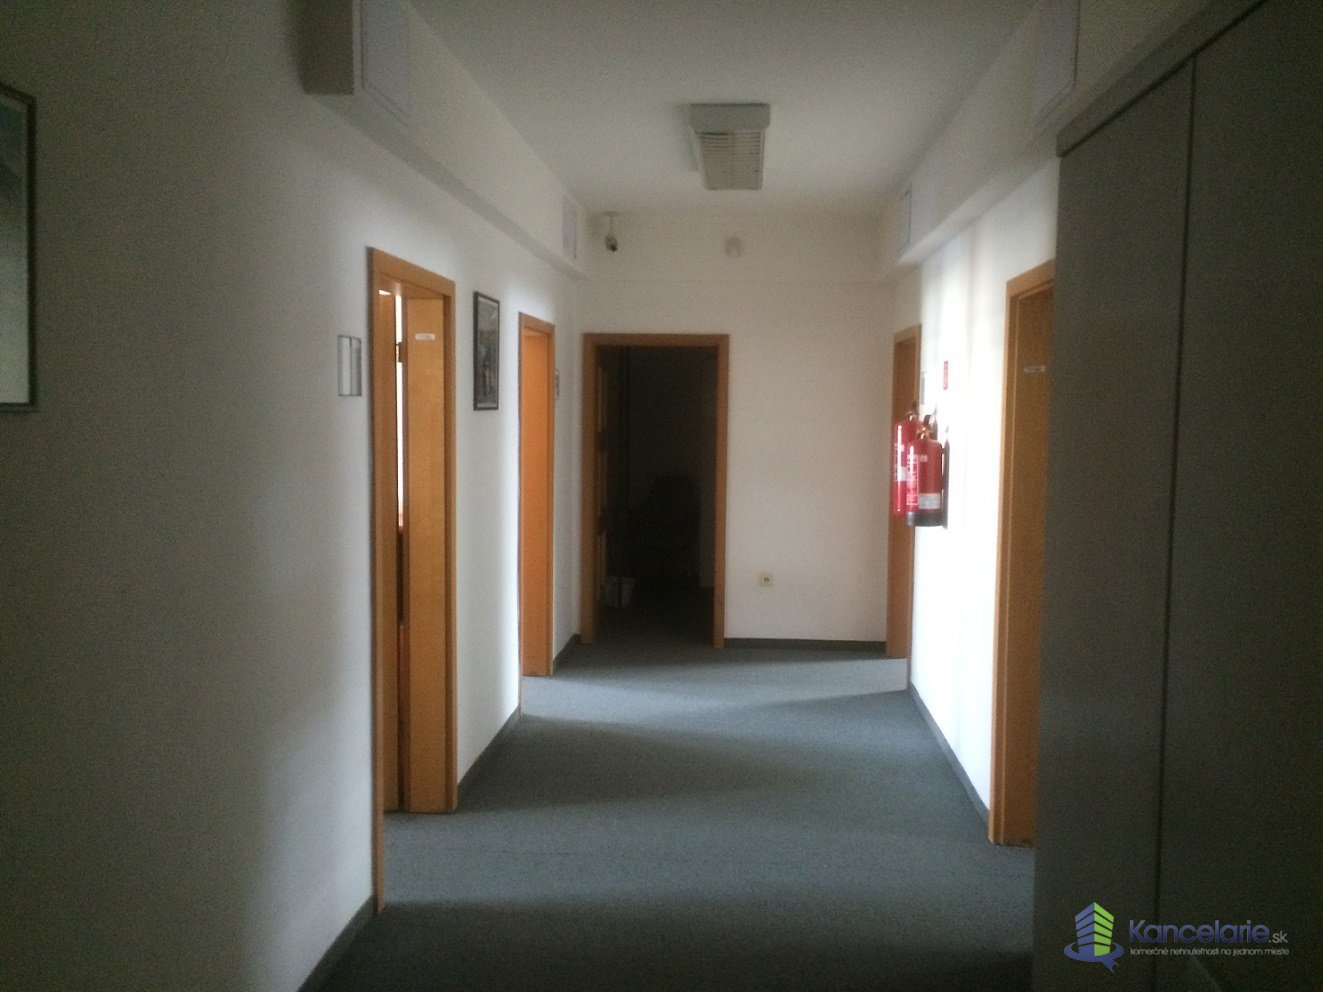 Kancelárska budova Gunduličova, Kancelárske priestory, Gunduličova 8, Bratislava